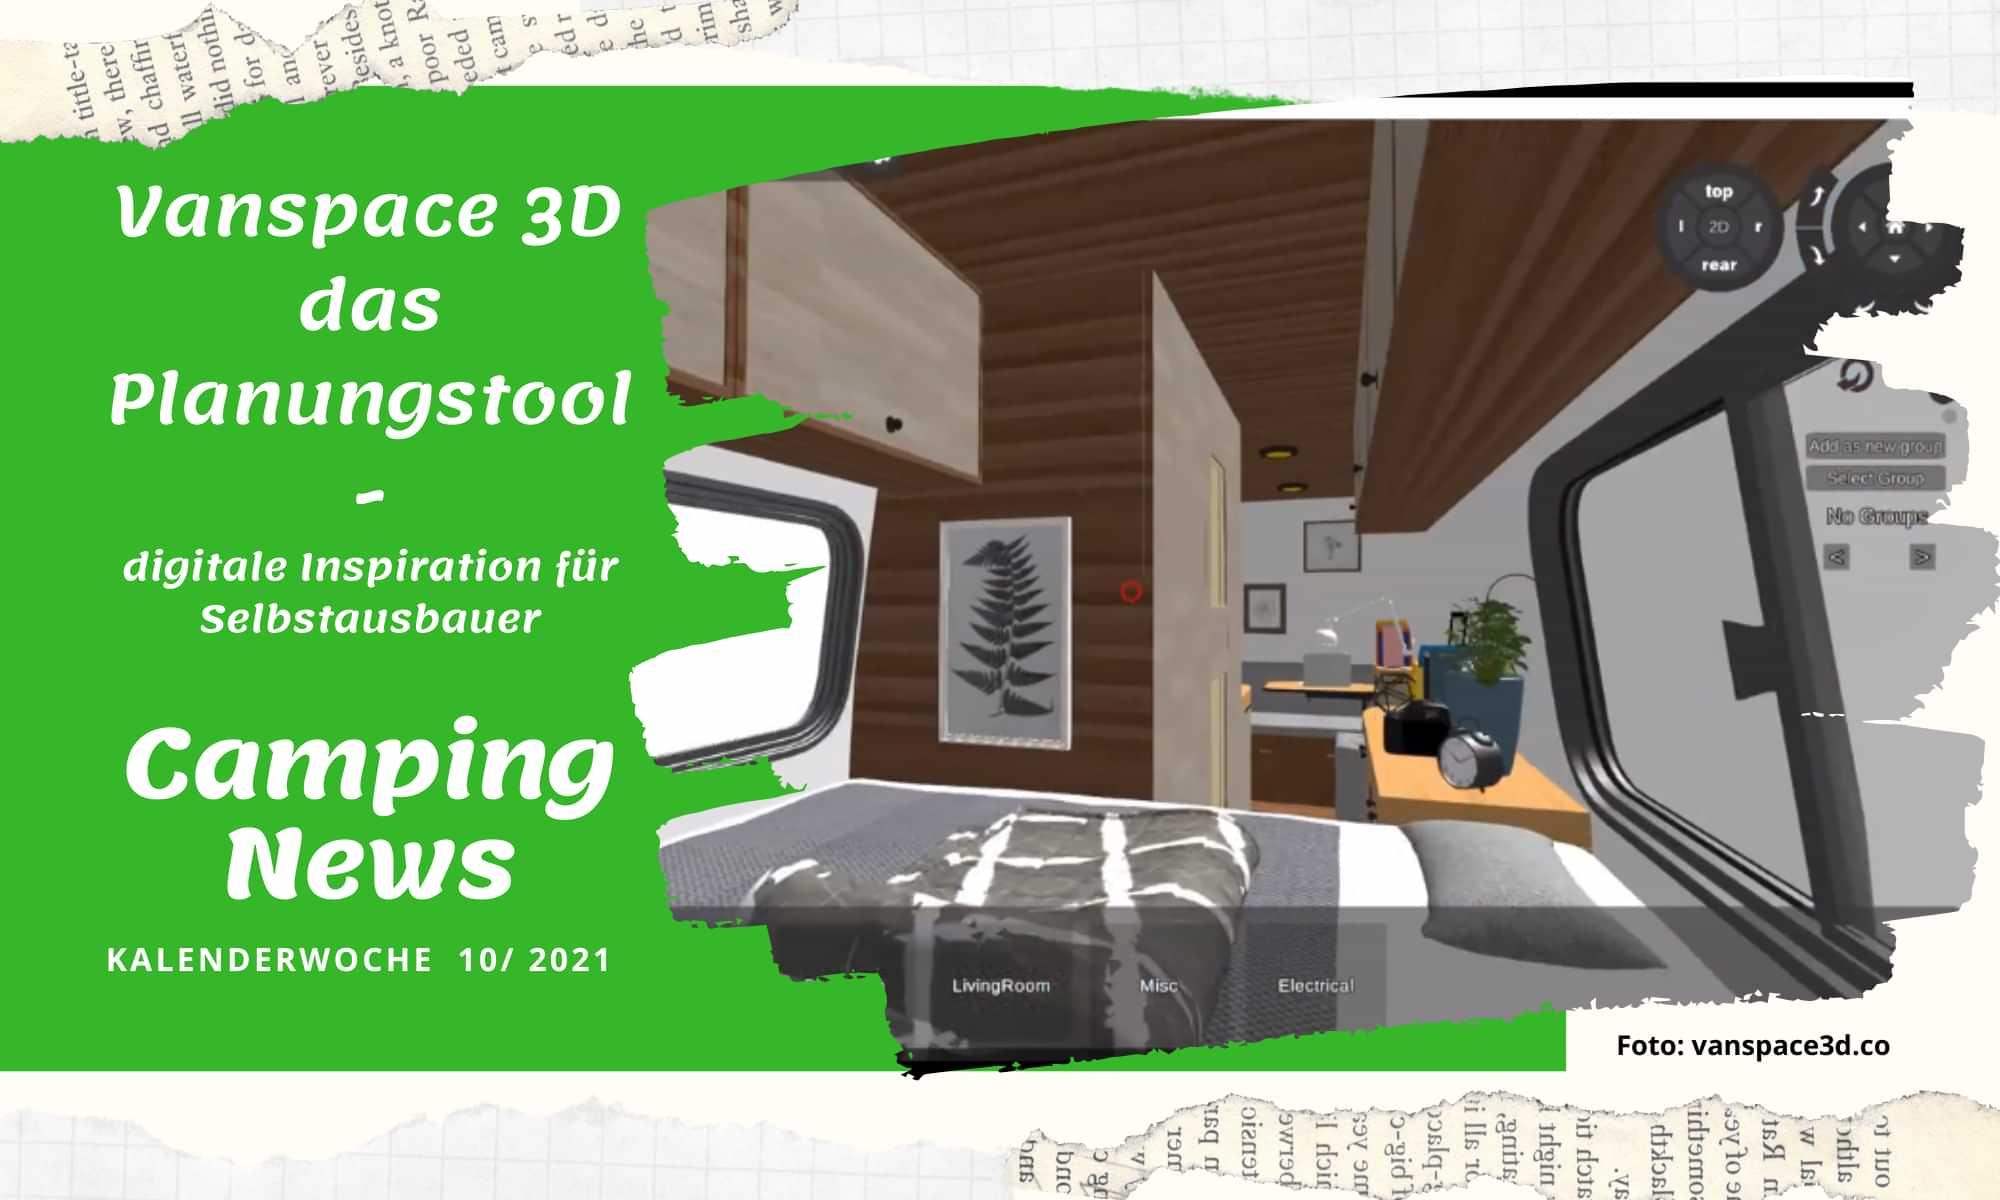 Vanspace 3D – das Planungstool